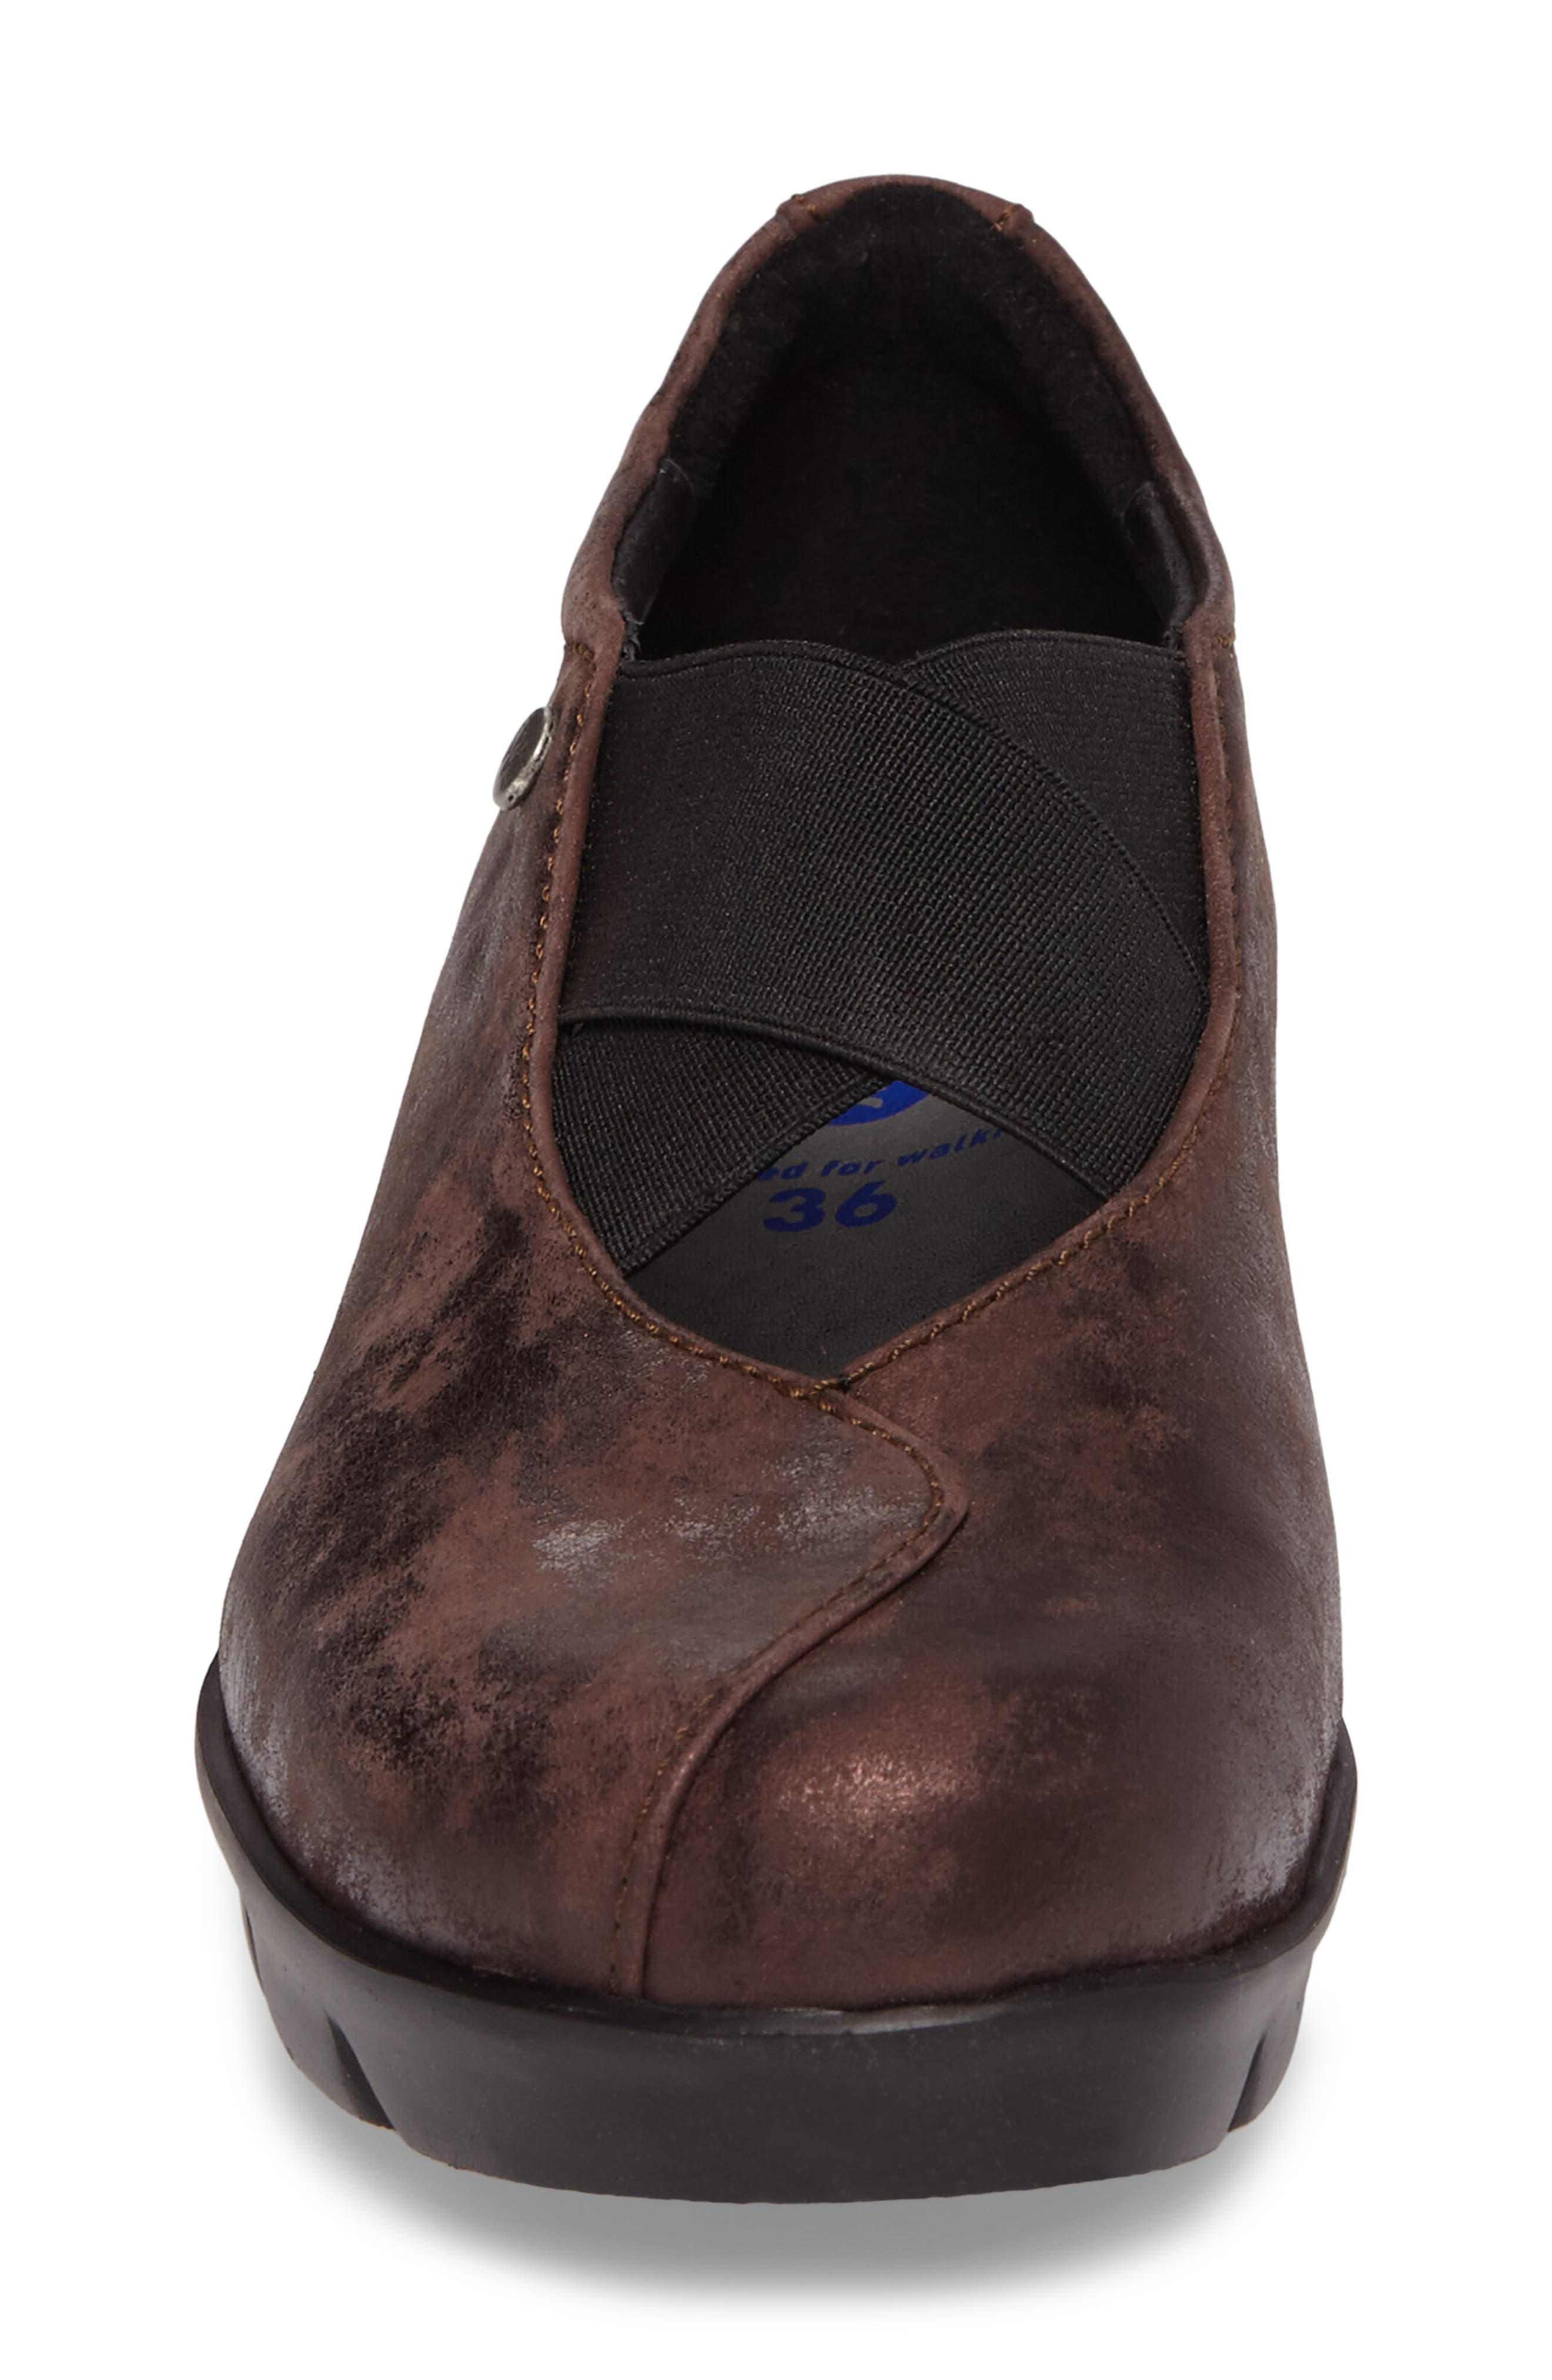 Cursa Slip-On Sneaker,                             Alternate thumbnail 4, color,                             Mocha Leather